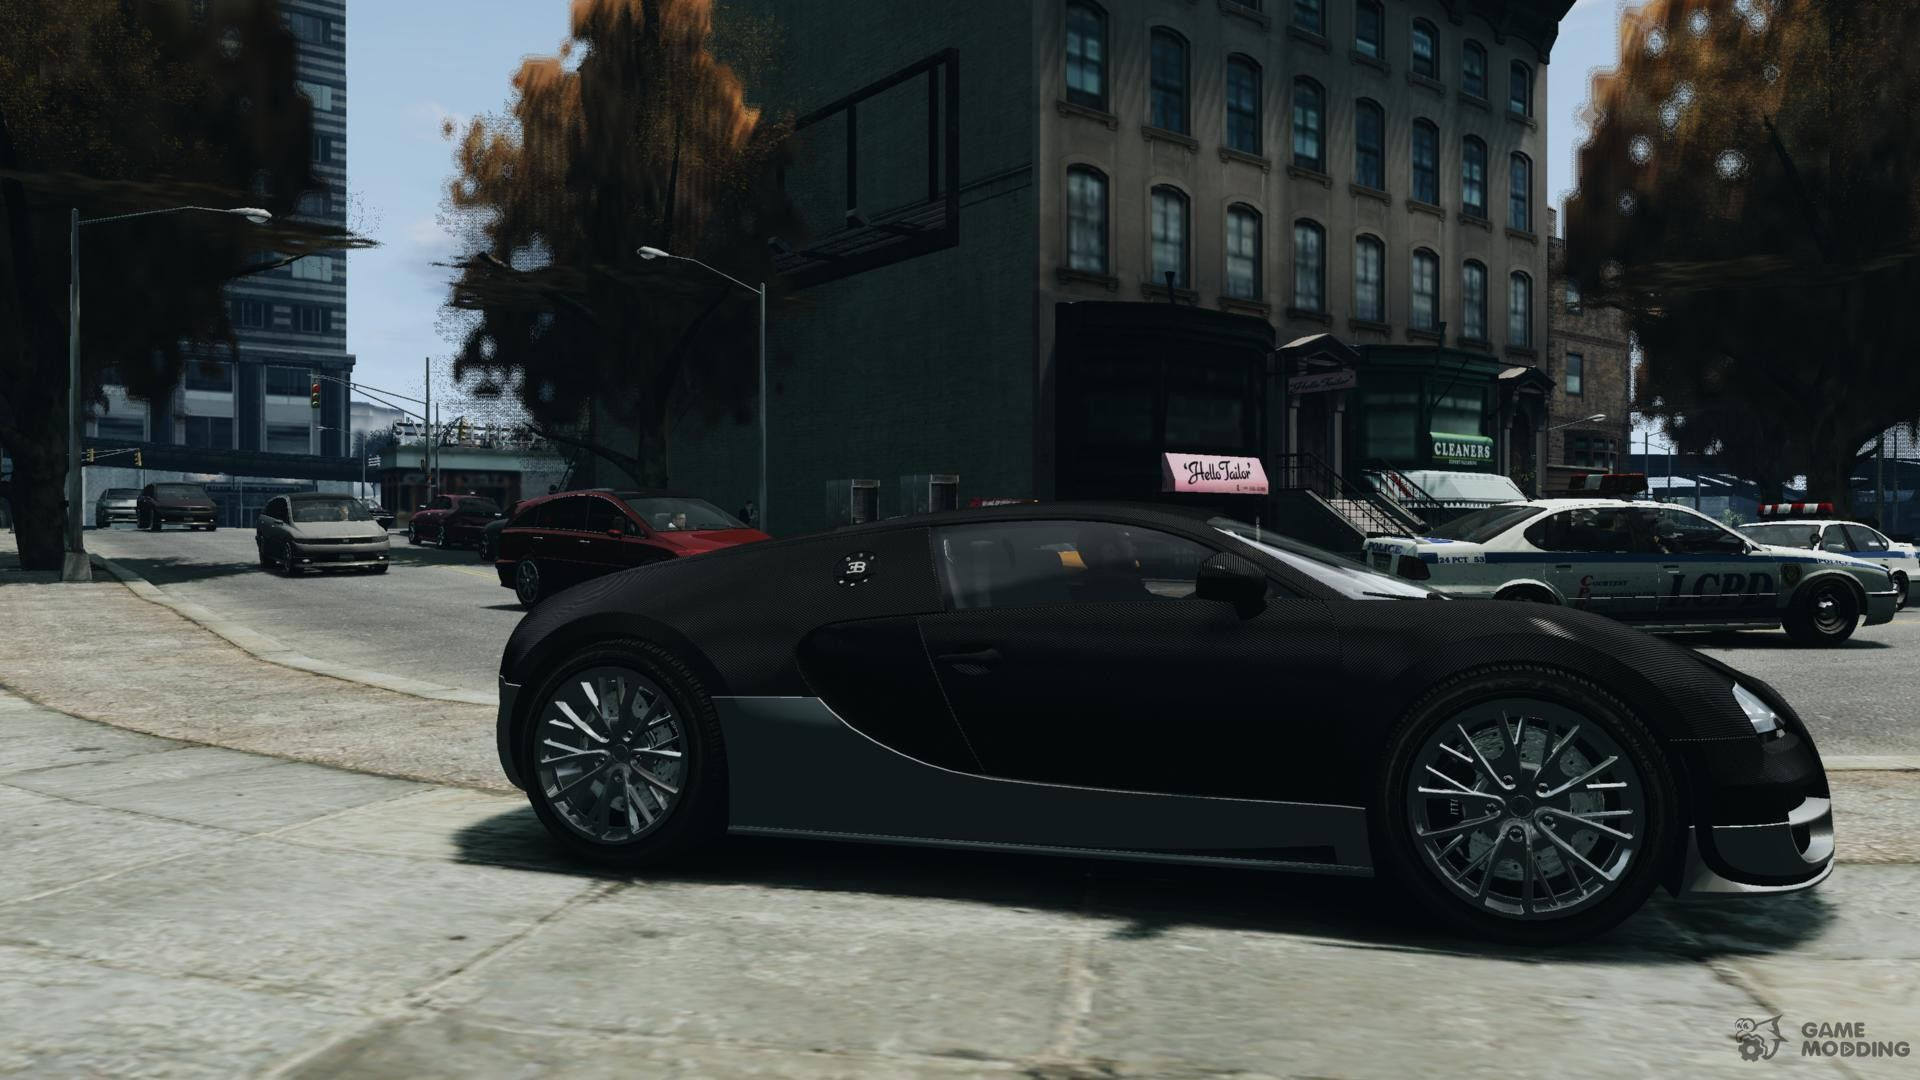 f7e65e1ef61f6c19ad3052352757b04c6c01196dfb2b46a809058c6d897abb35 Wonderful Bugatti Veyron Xbox 360 Games Cars Trend